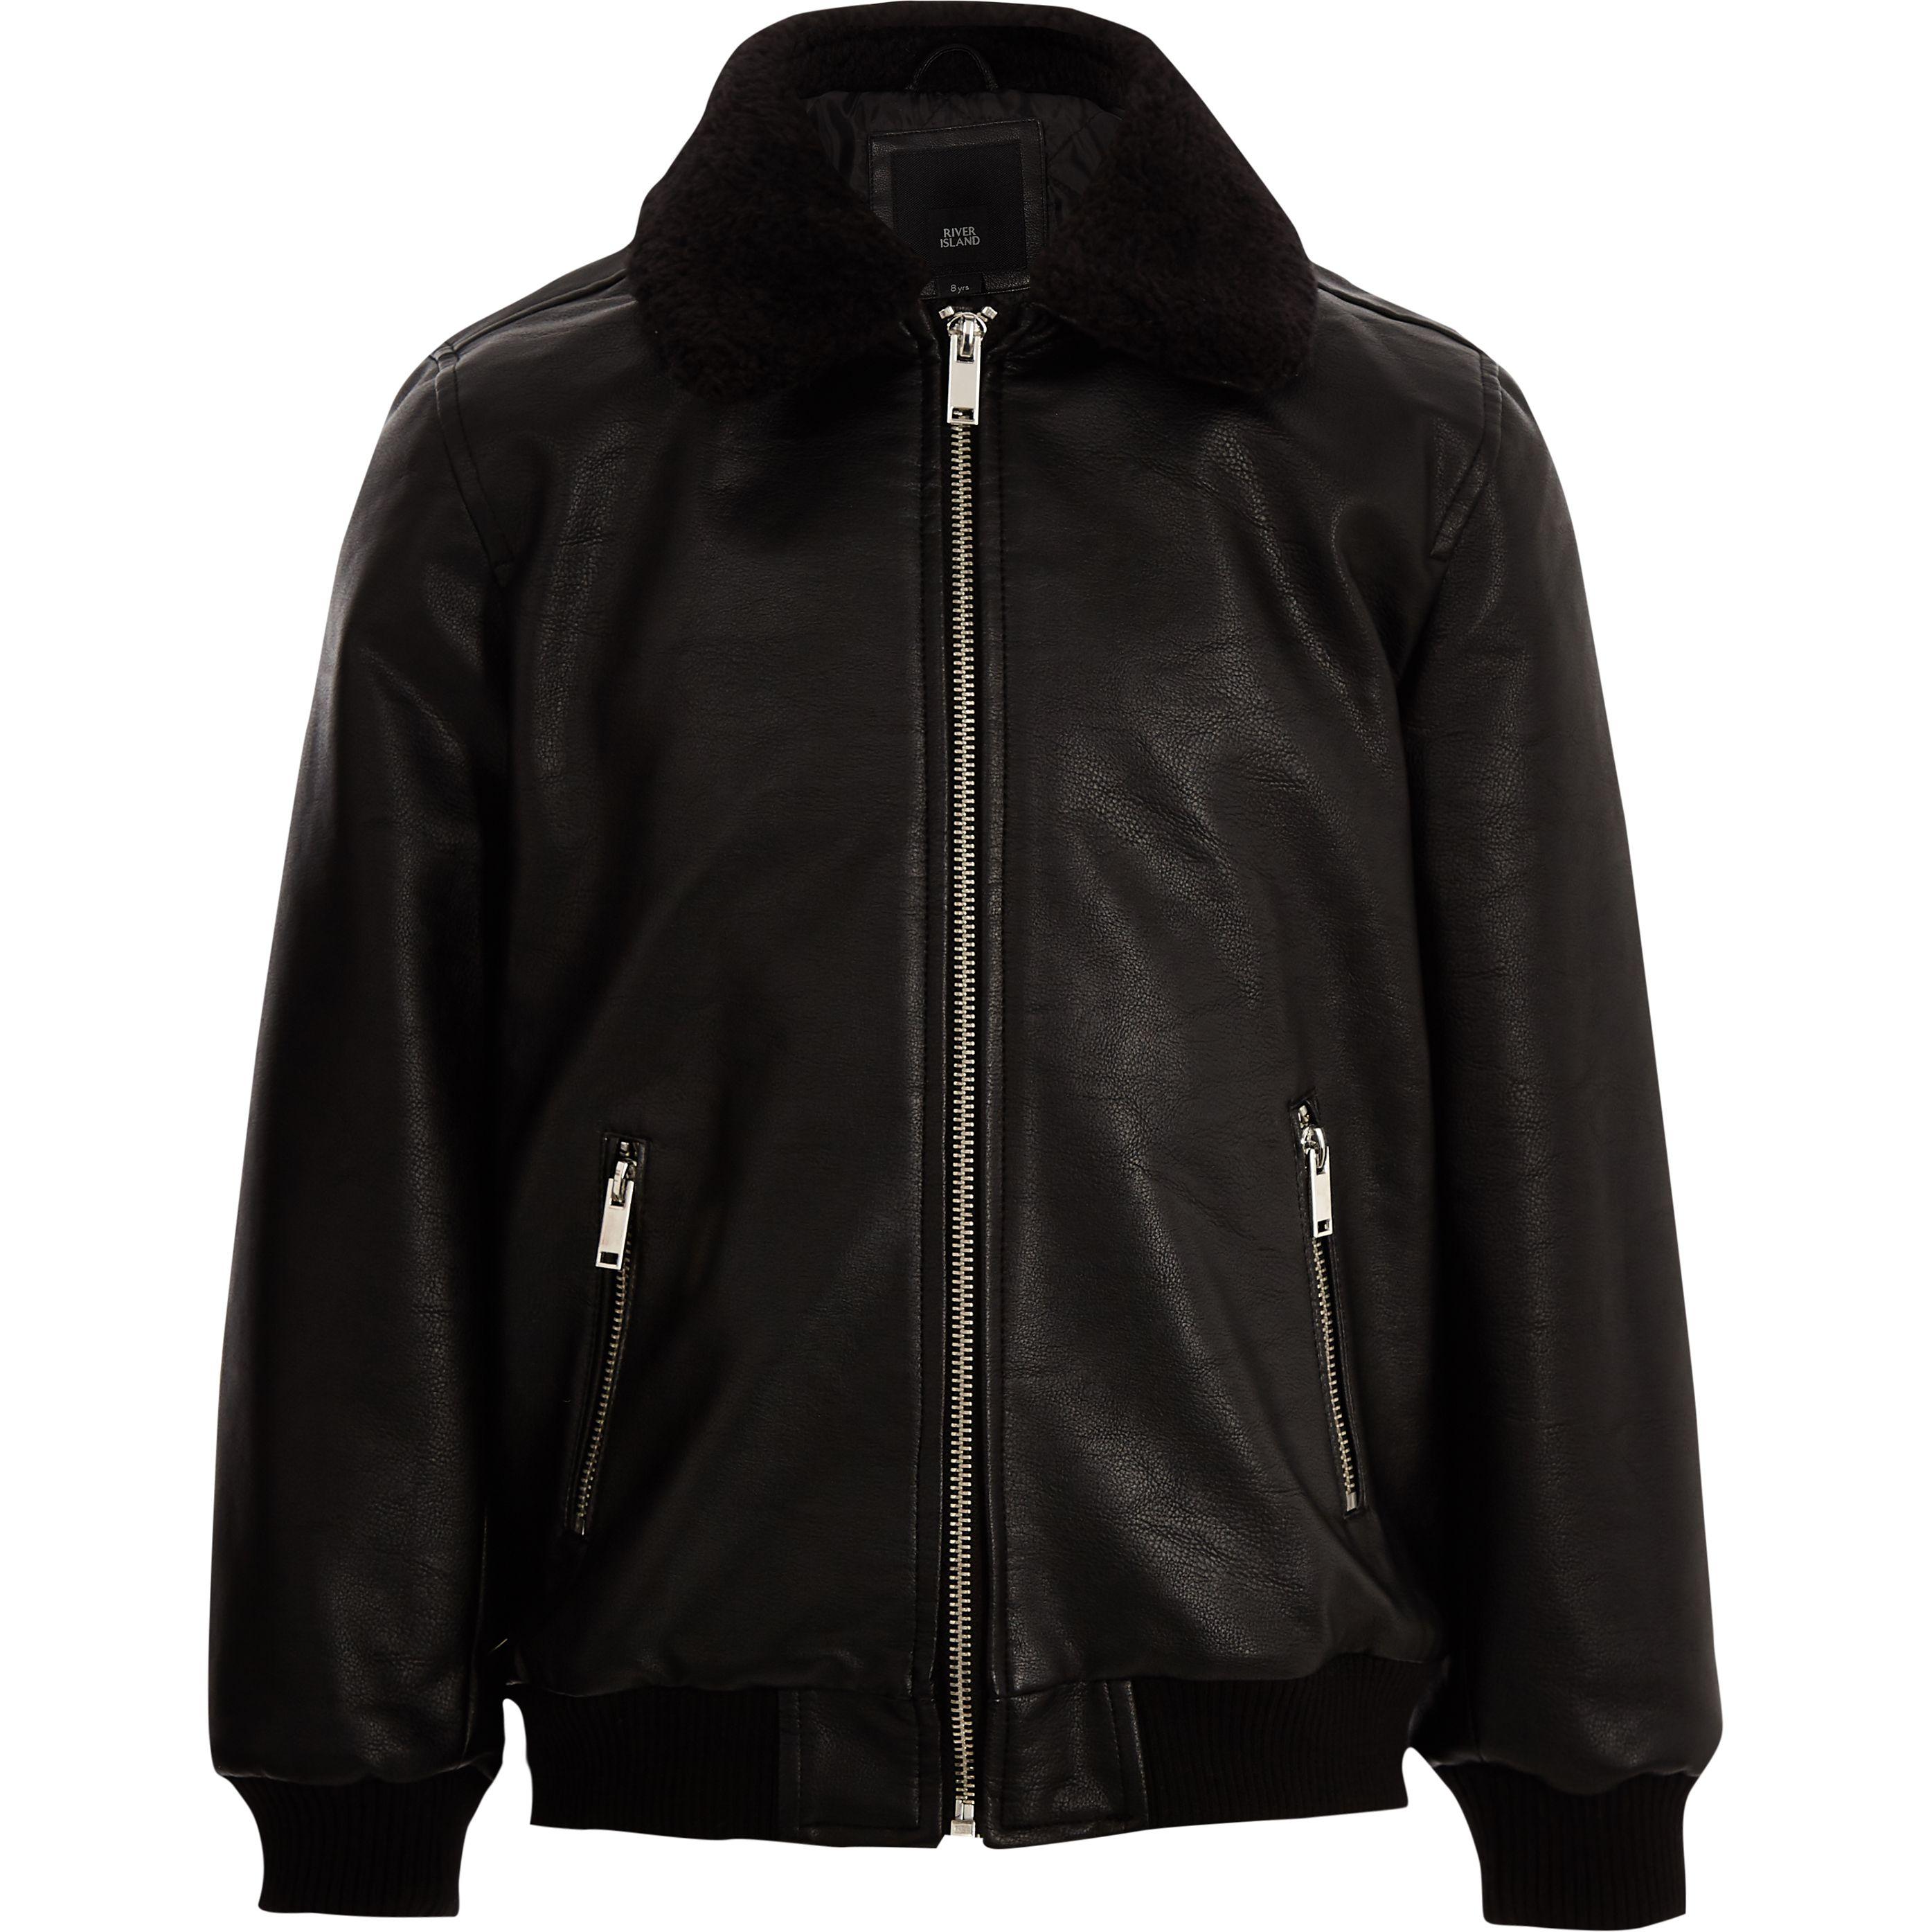 Boys black faux leather borg collar jacket | Borg collar ...